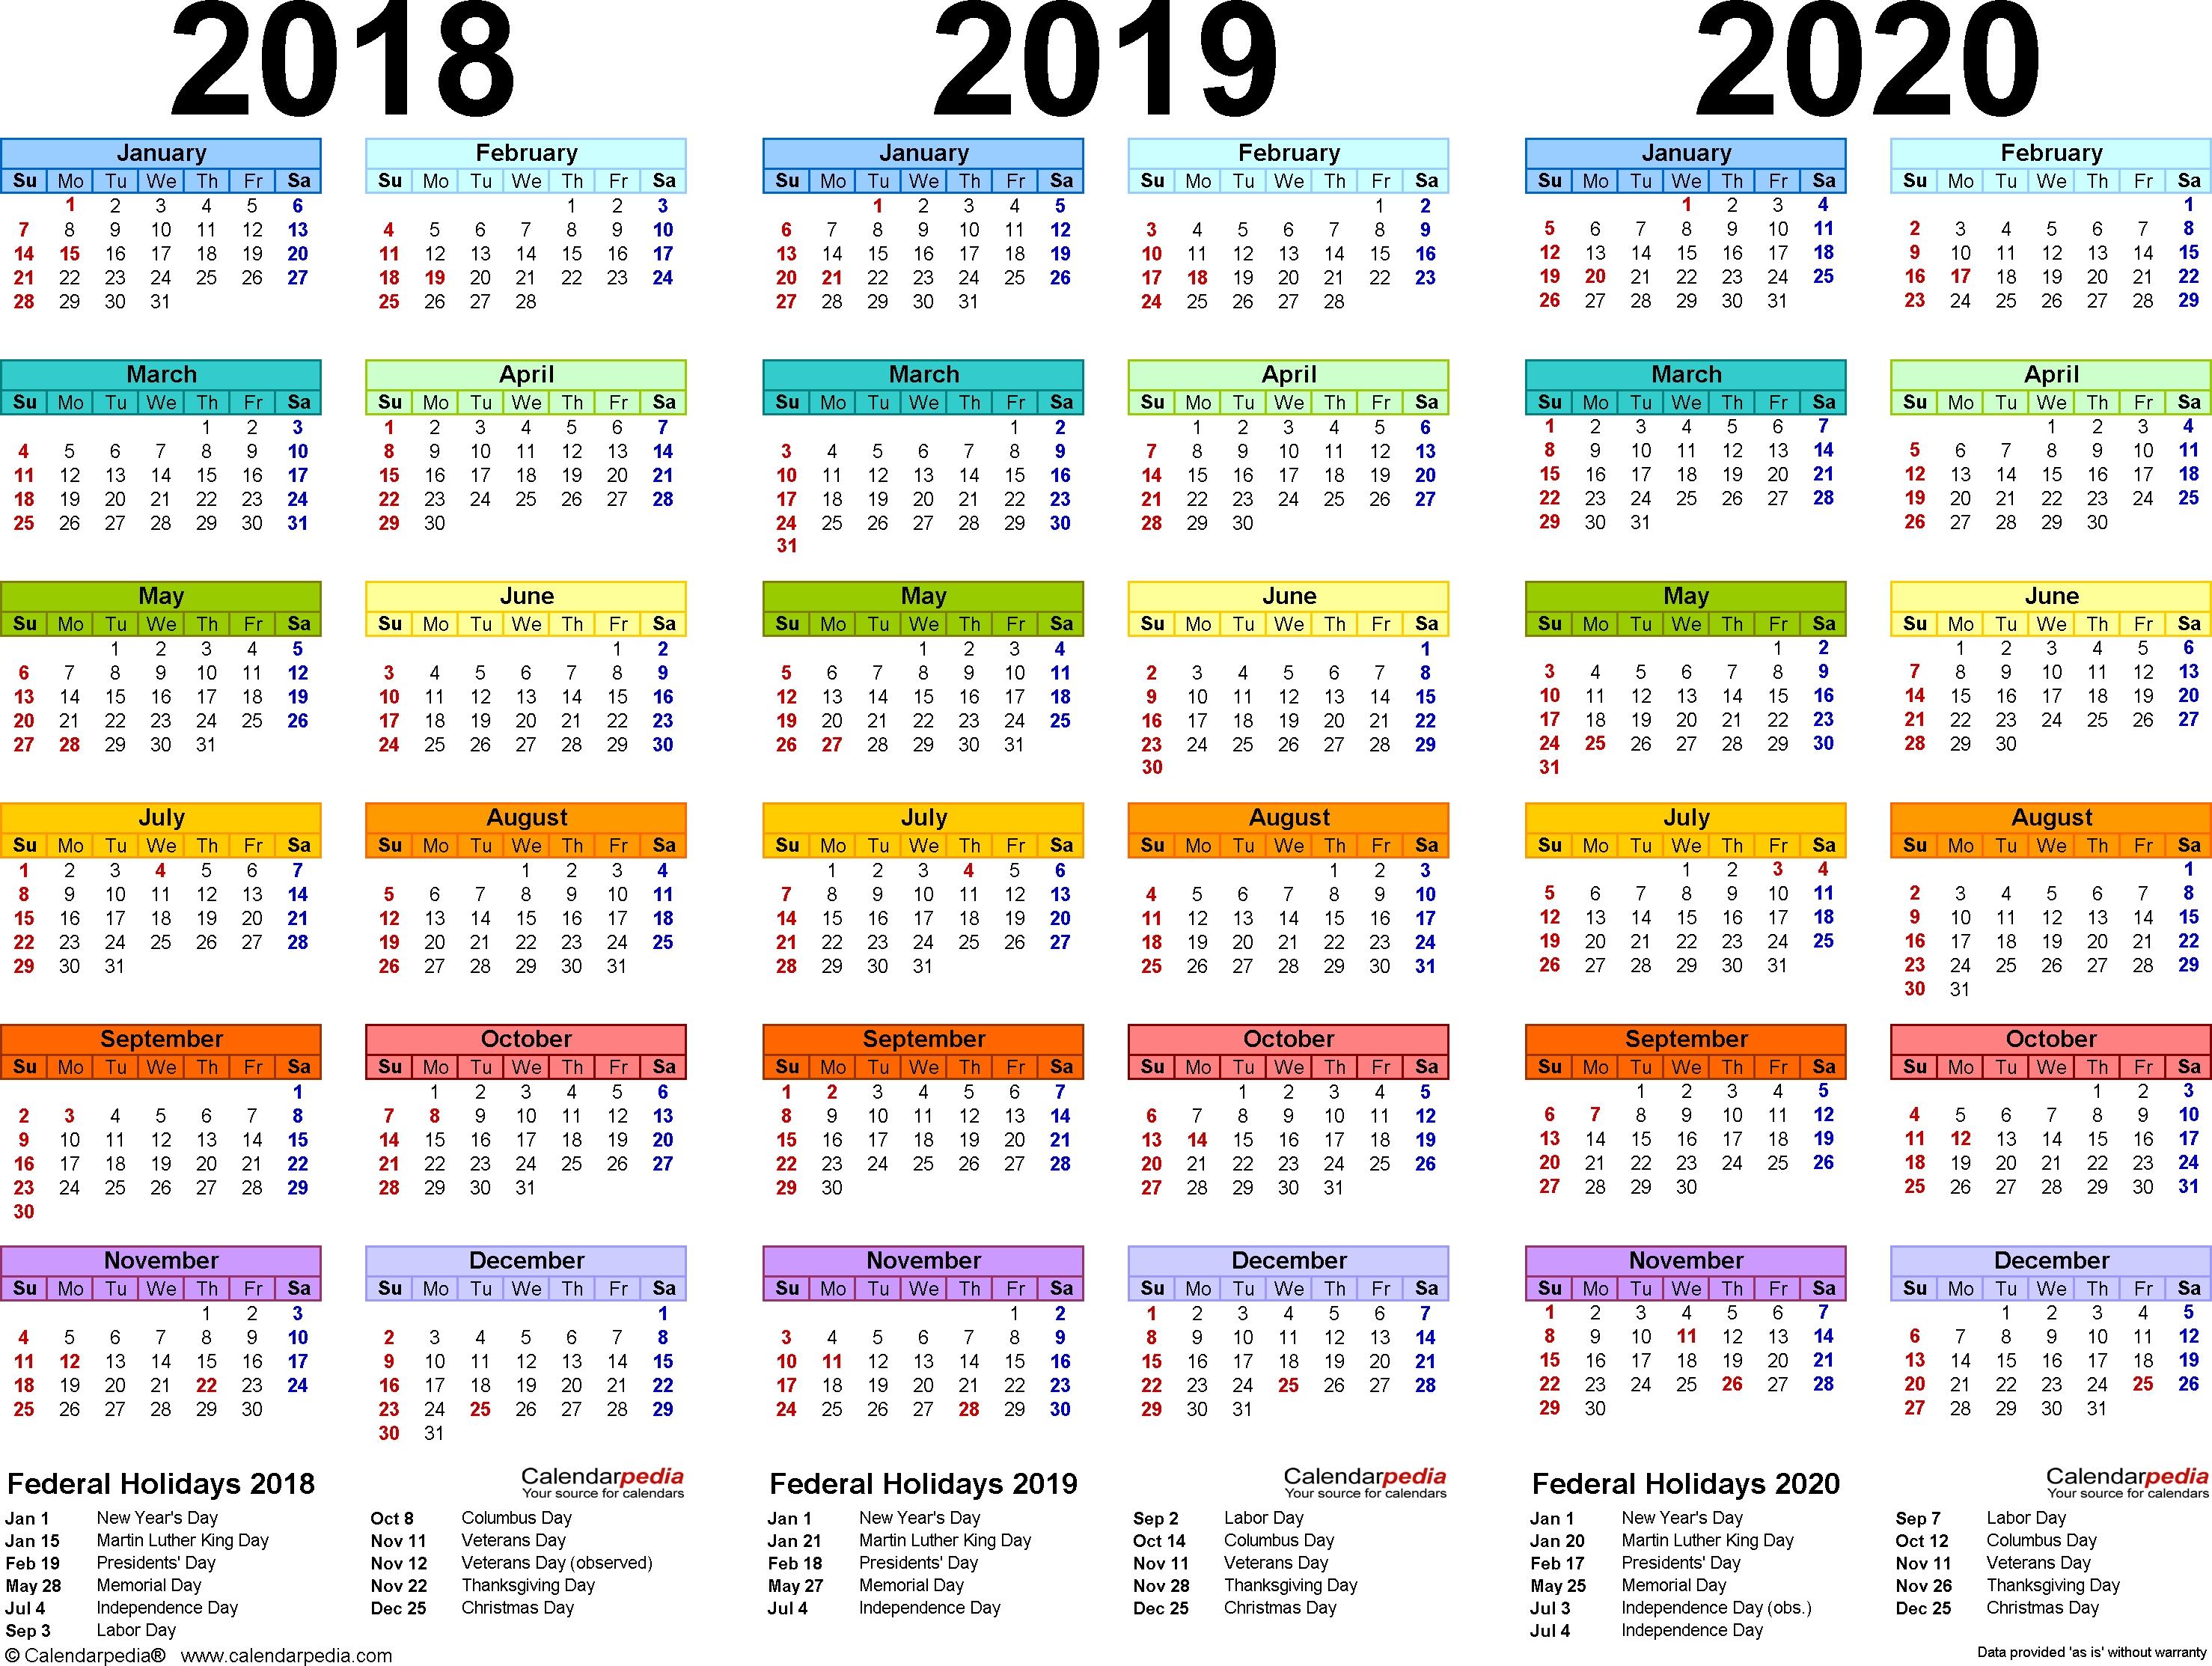 2018/2019/2020 Calendar - 4 Three-Year Printable Pdf Calendars intended for 3 Year Calendar 2019 2020 2021